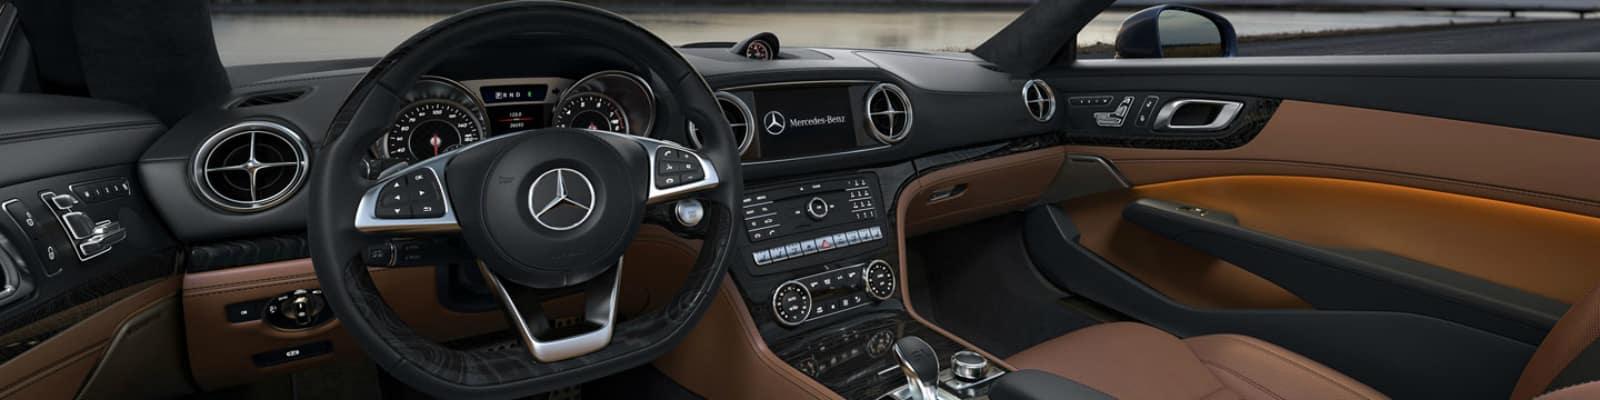 2018 Mercedes-Benz SL Roadster dashboard